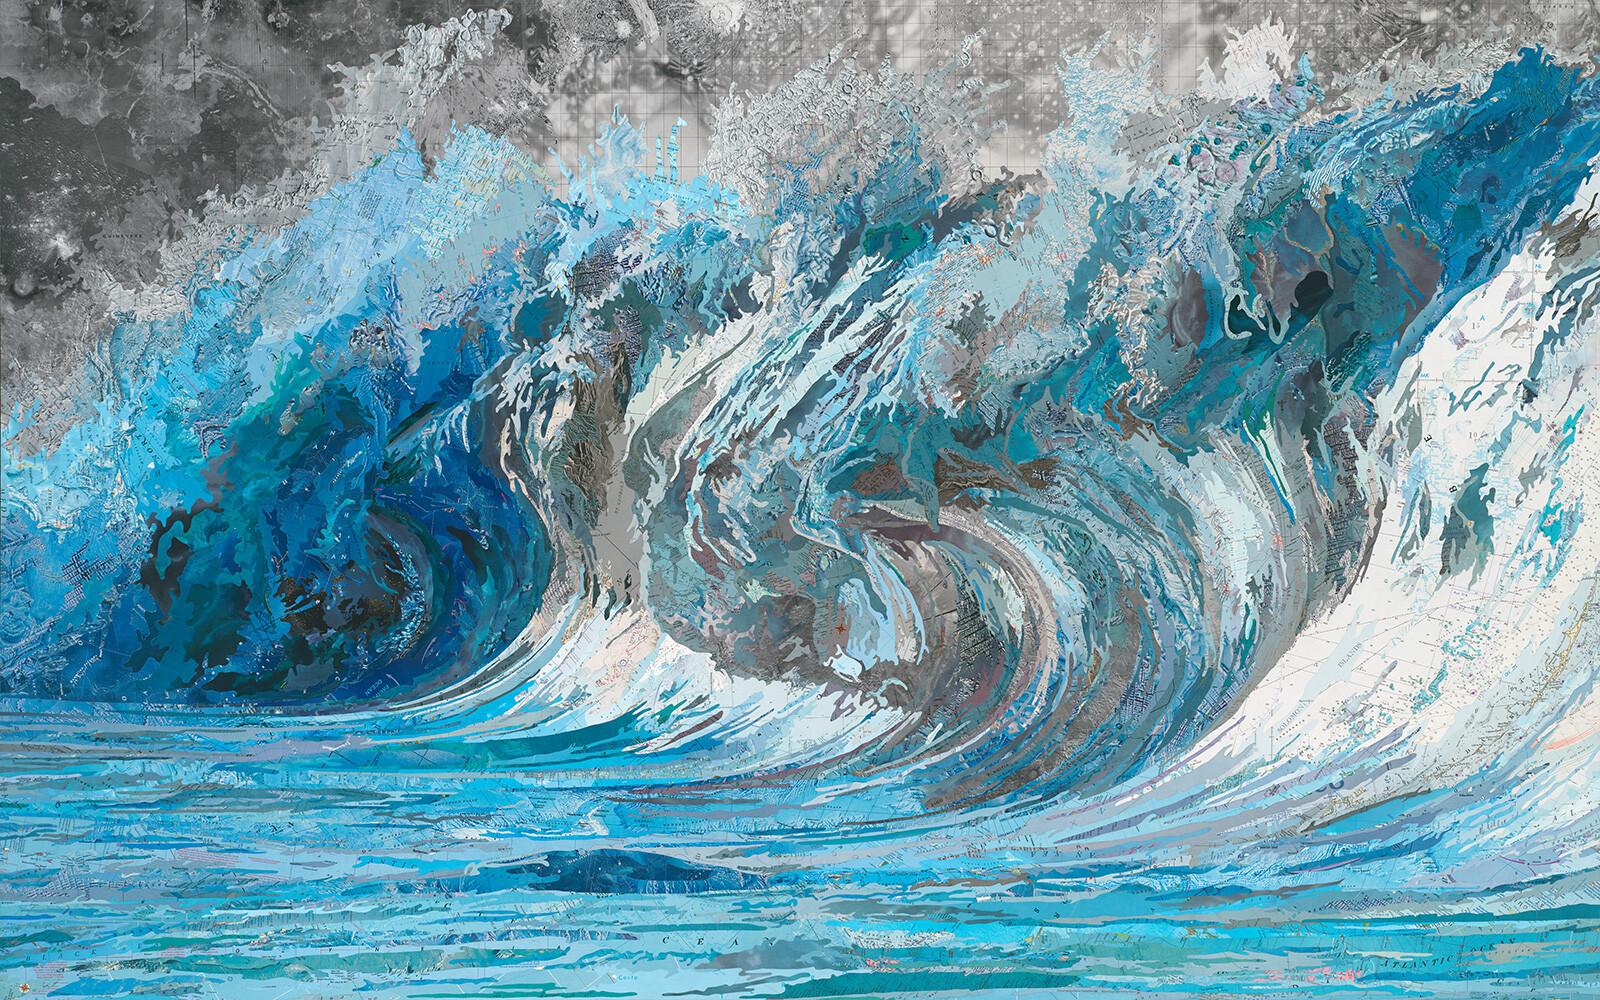 Genevieve's Wave - Matthew Cusick